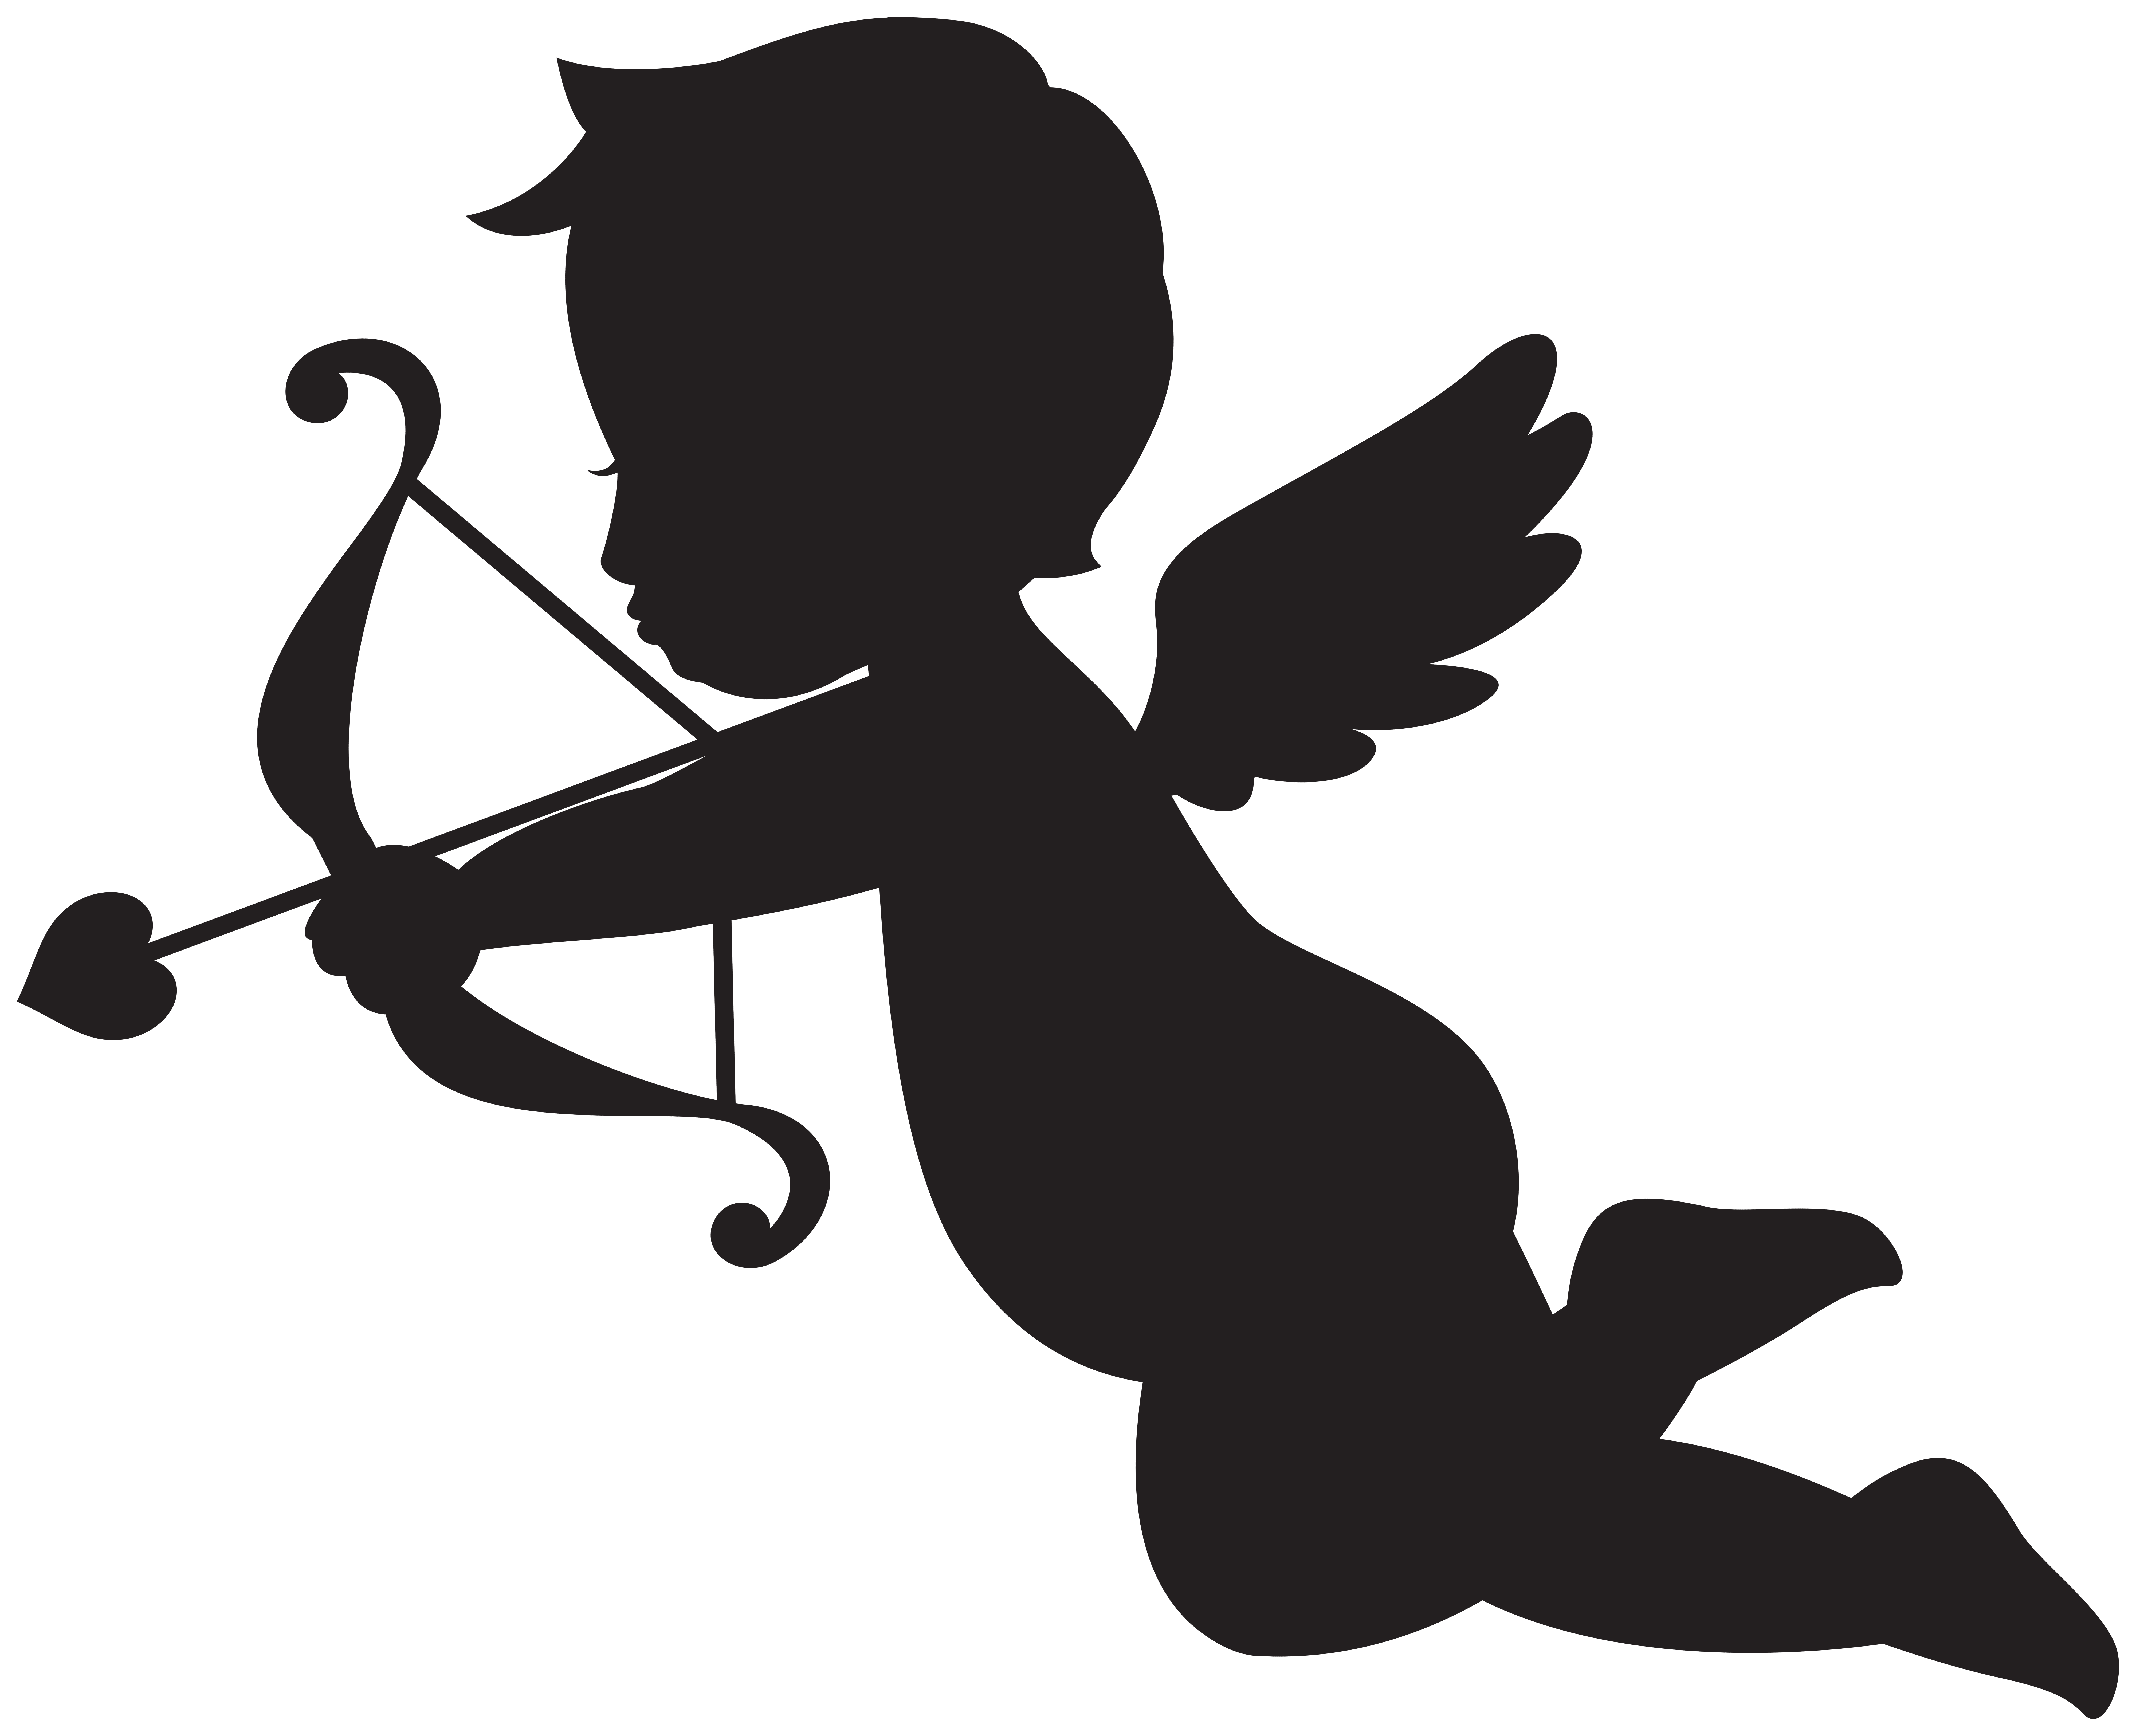 Cupid Silhouette Transparent Image.